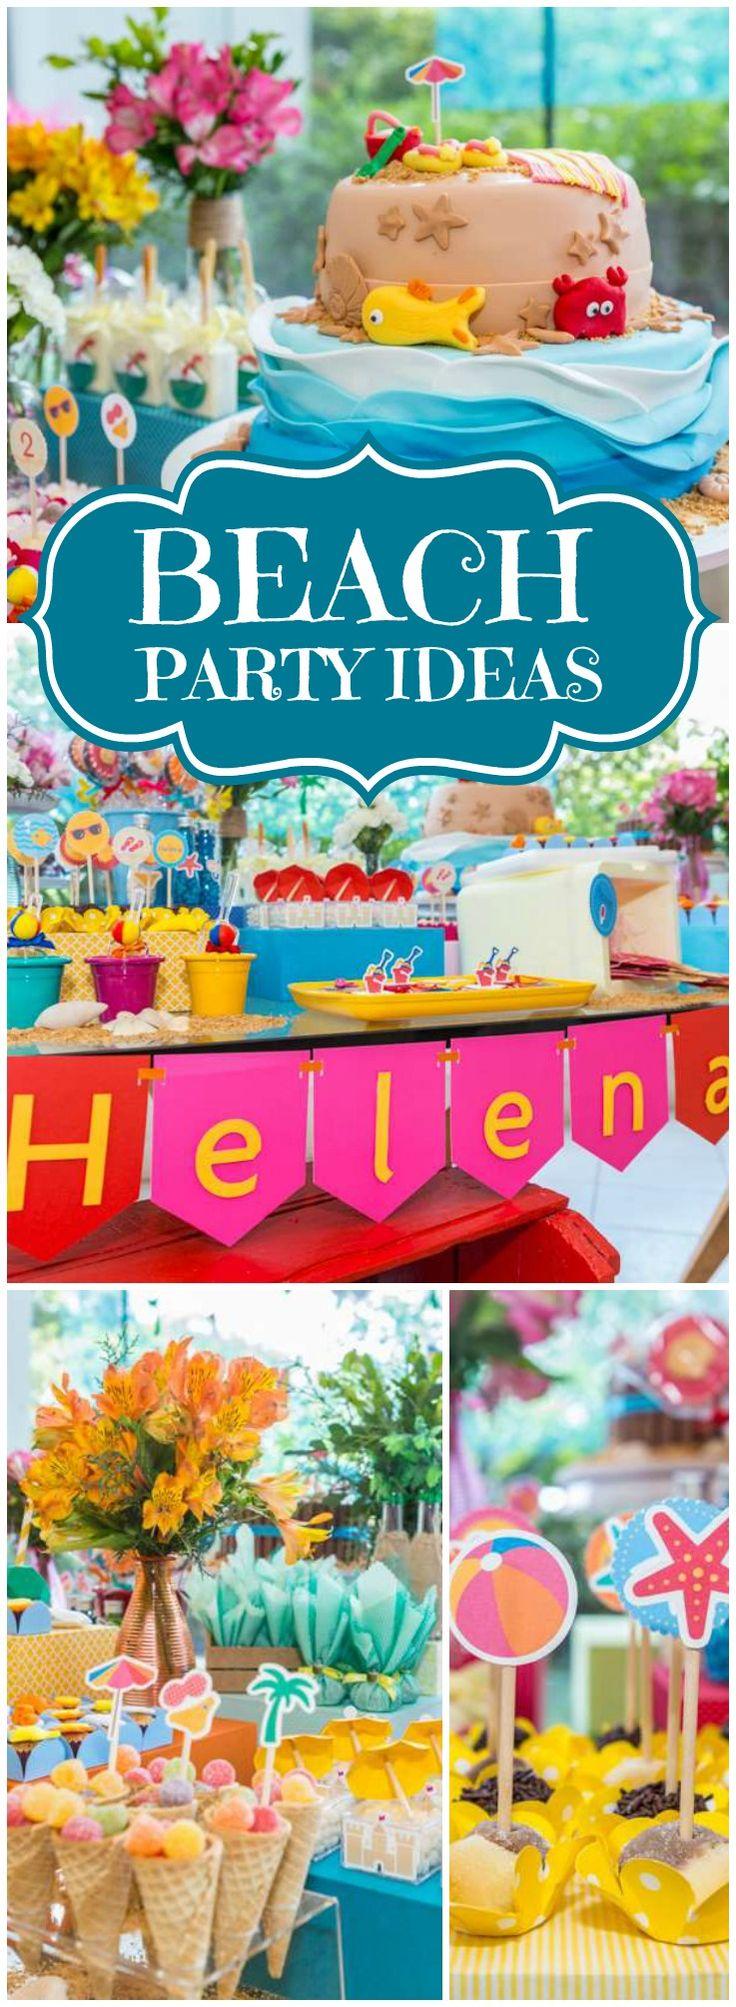 896 best LUAU IDEAS images on Pinterest | Tropical party, Party ...